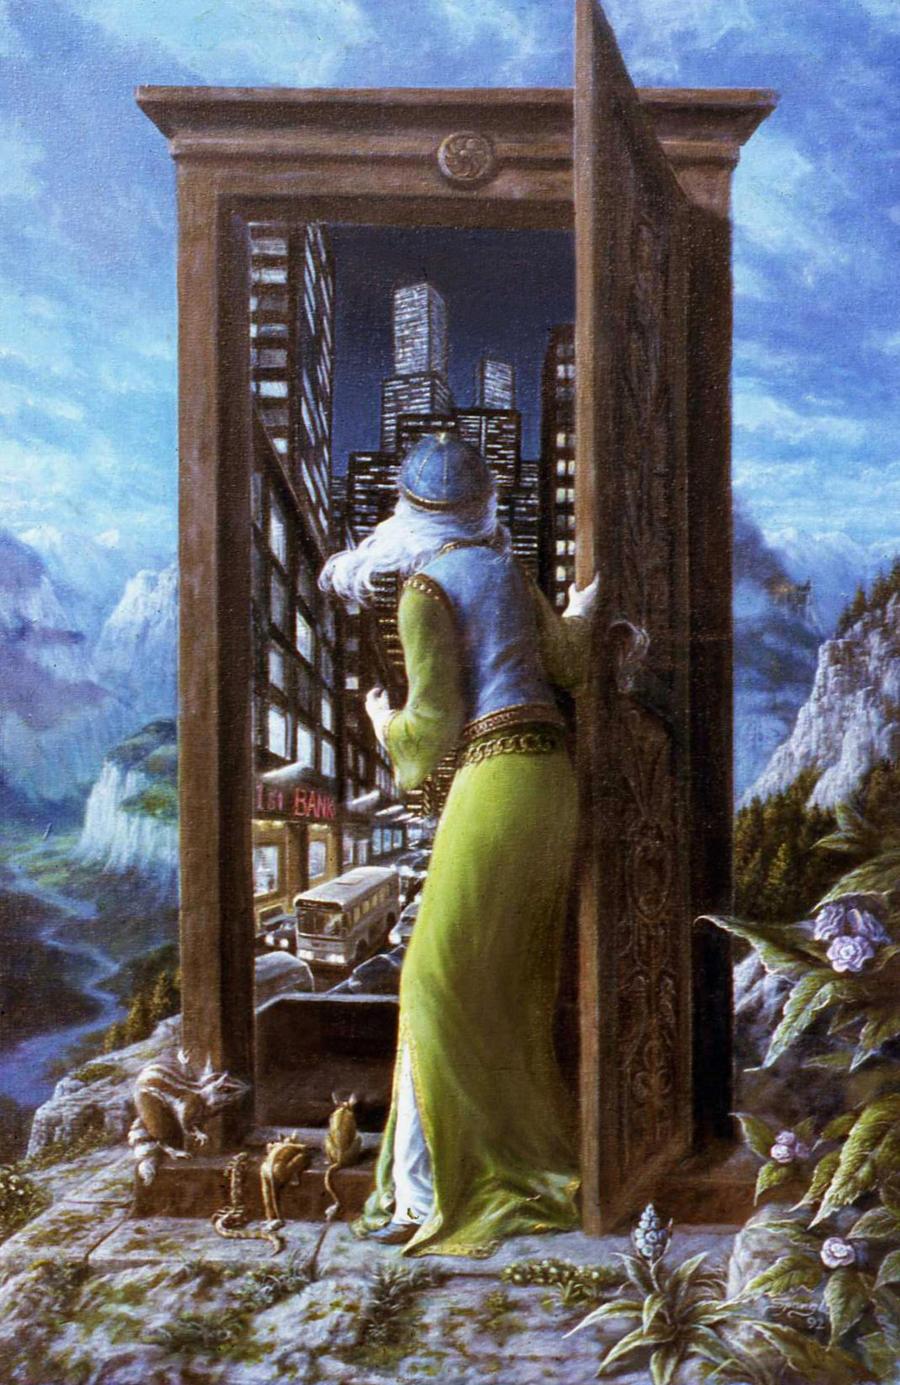 Iron Door by Keithspangle